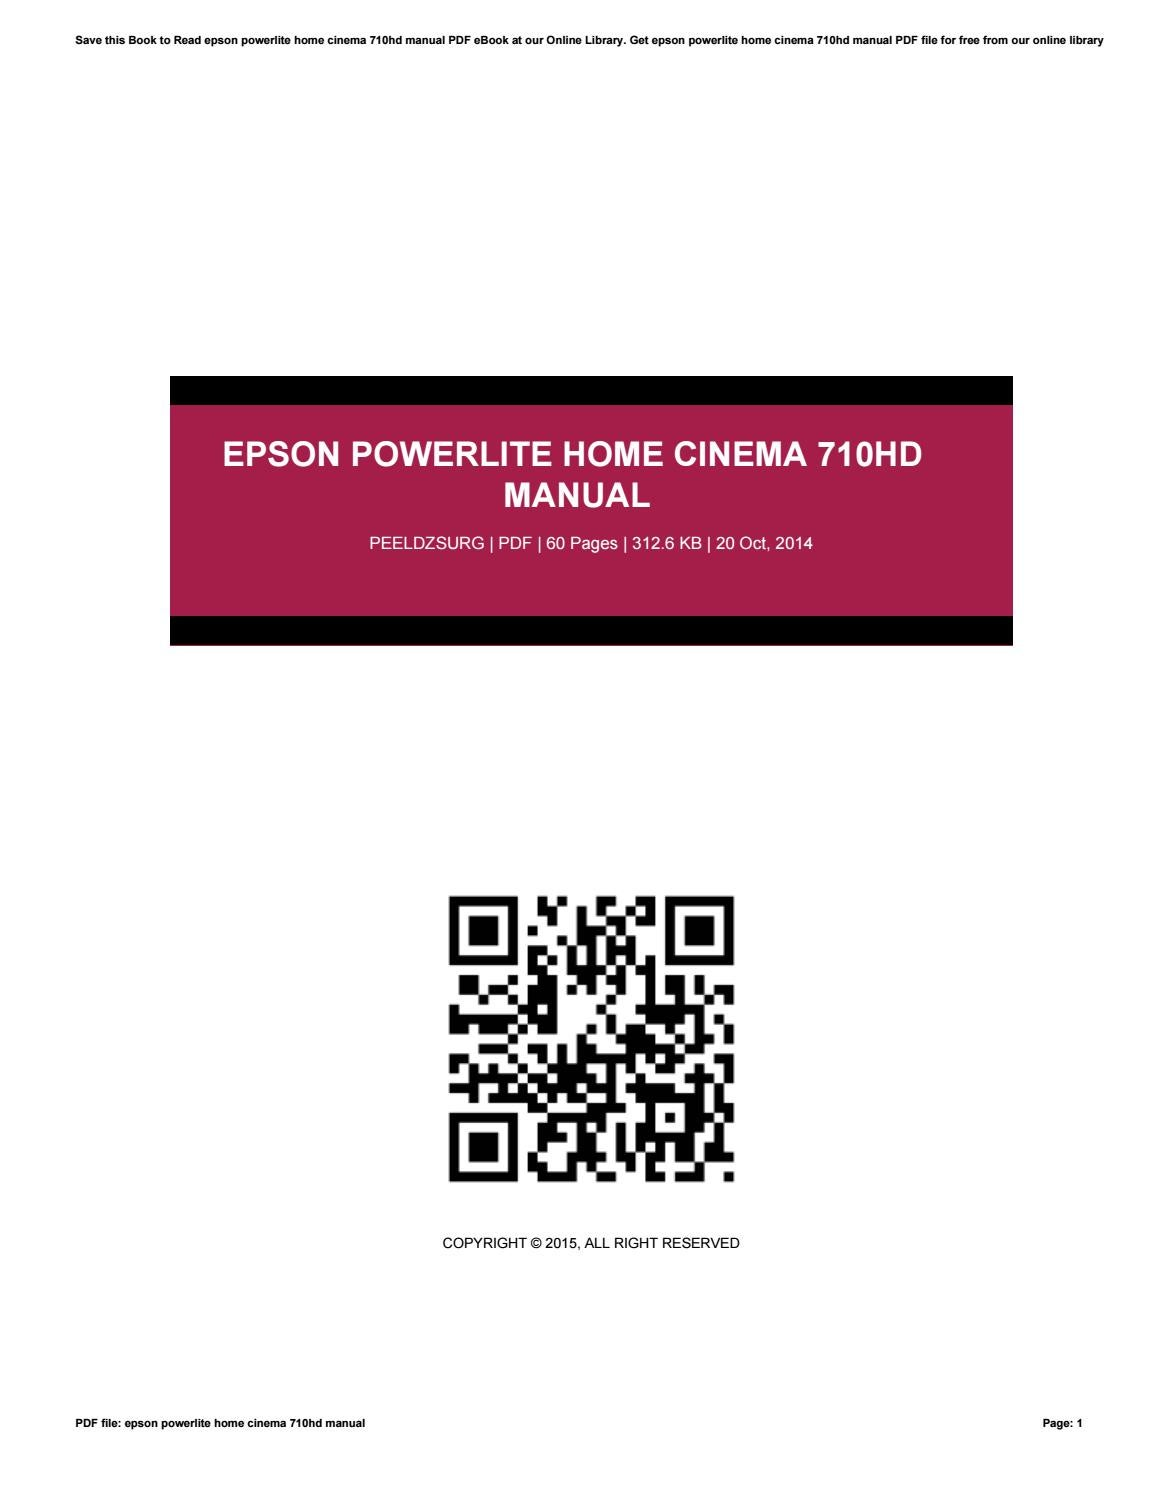 epson powerlite home cinema 710hd manual